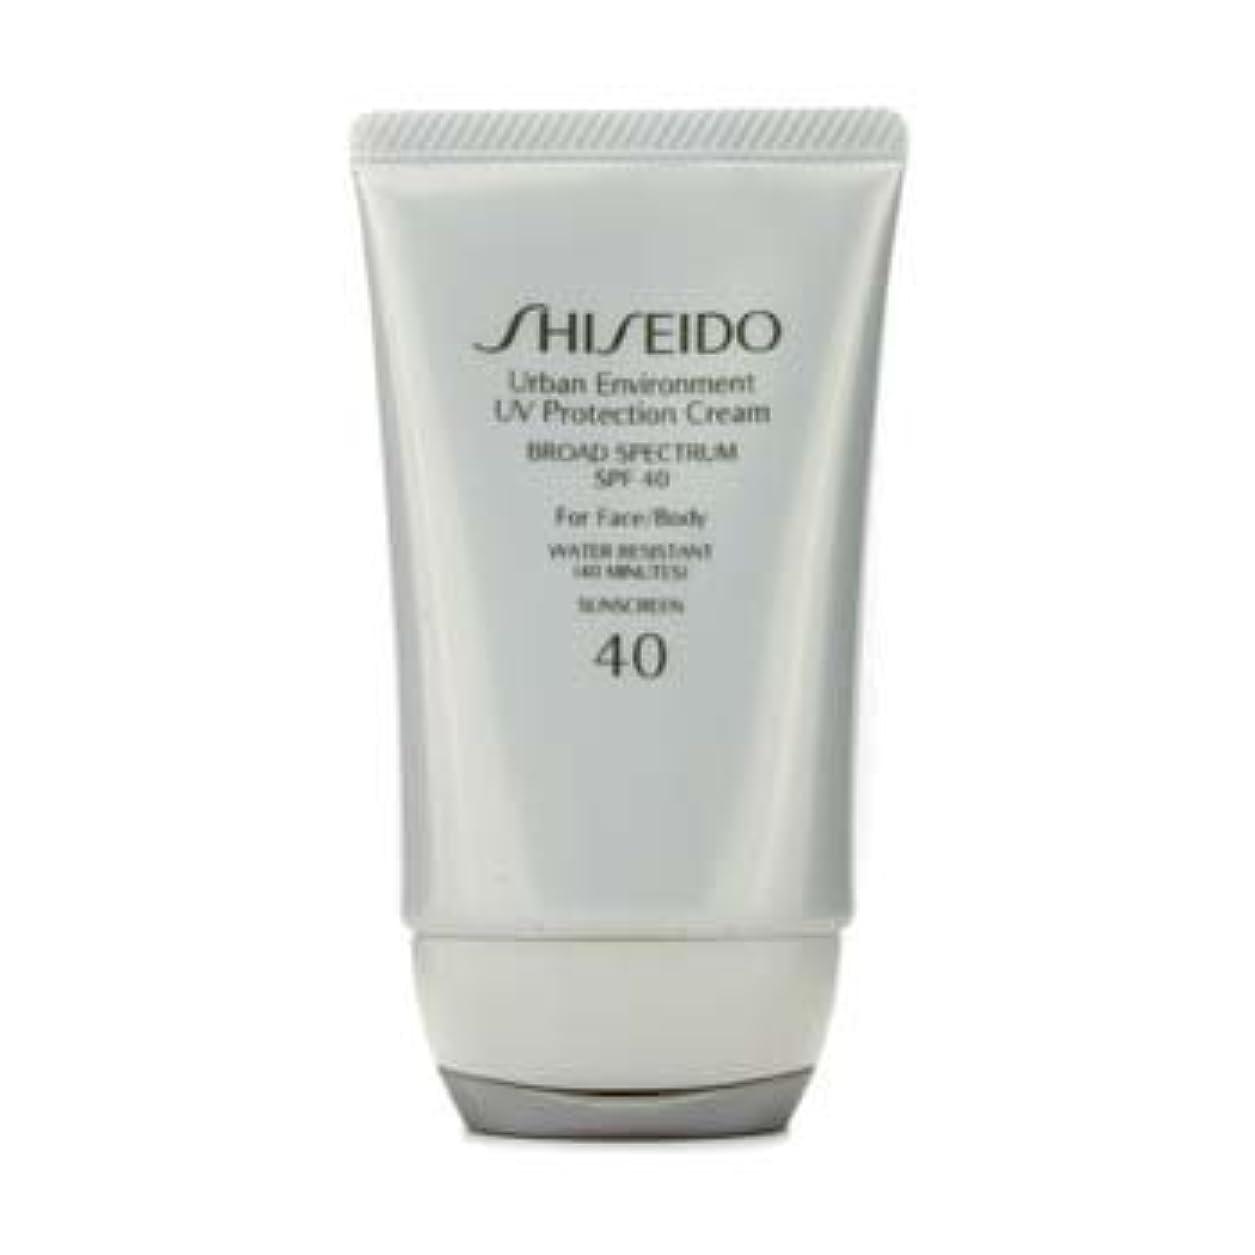 Shiseido Urban Environment UV Protection Cream SPF 40 (For Face & Body) - 50ml/1.9oz by Shiseido [並行輸入品]